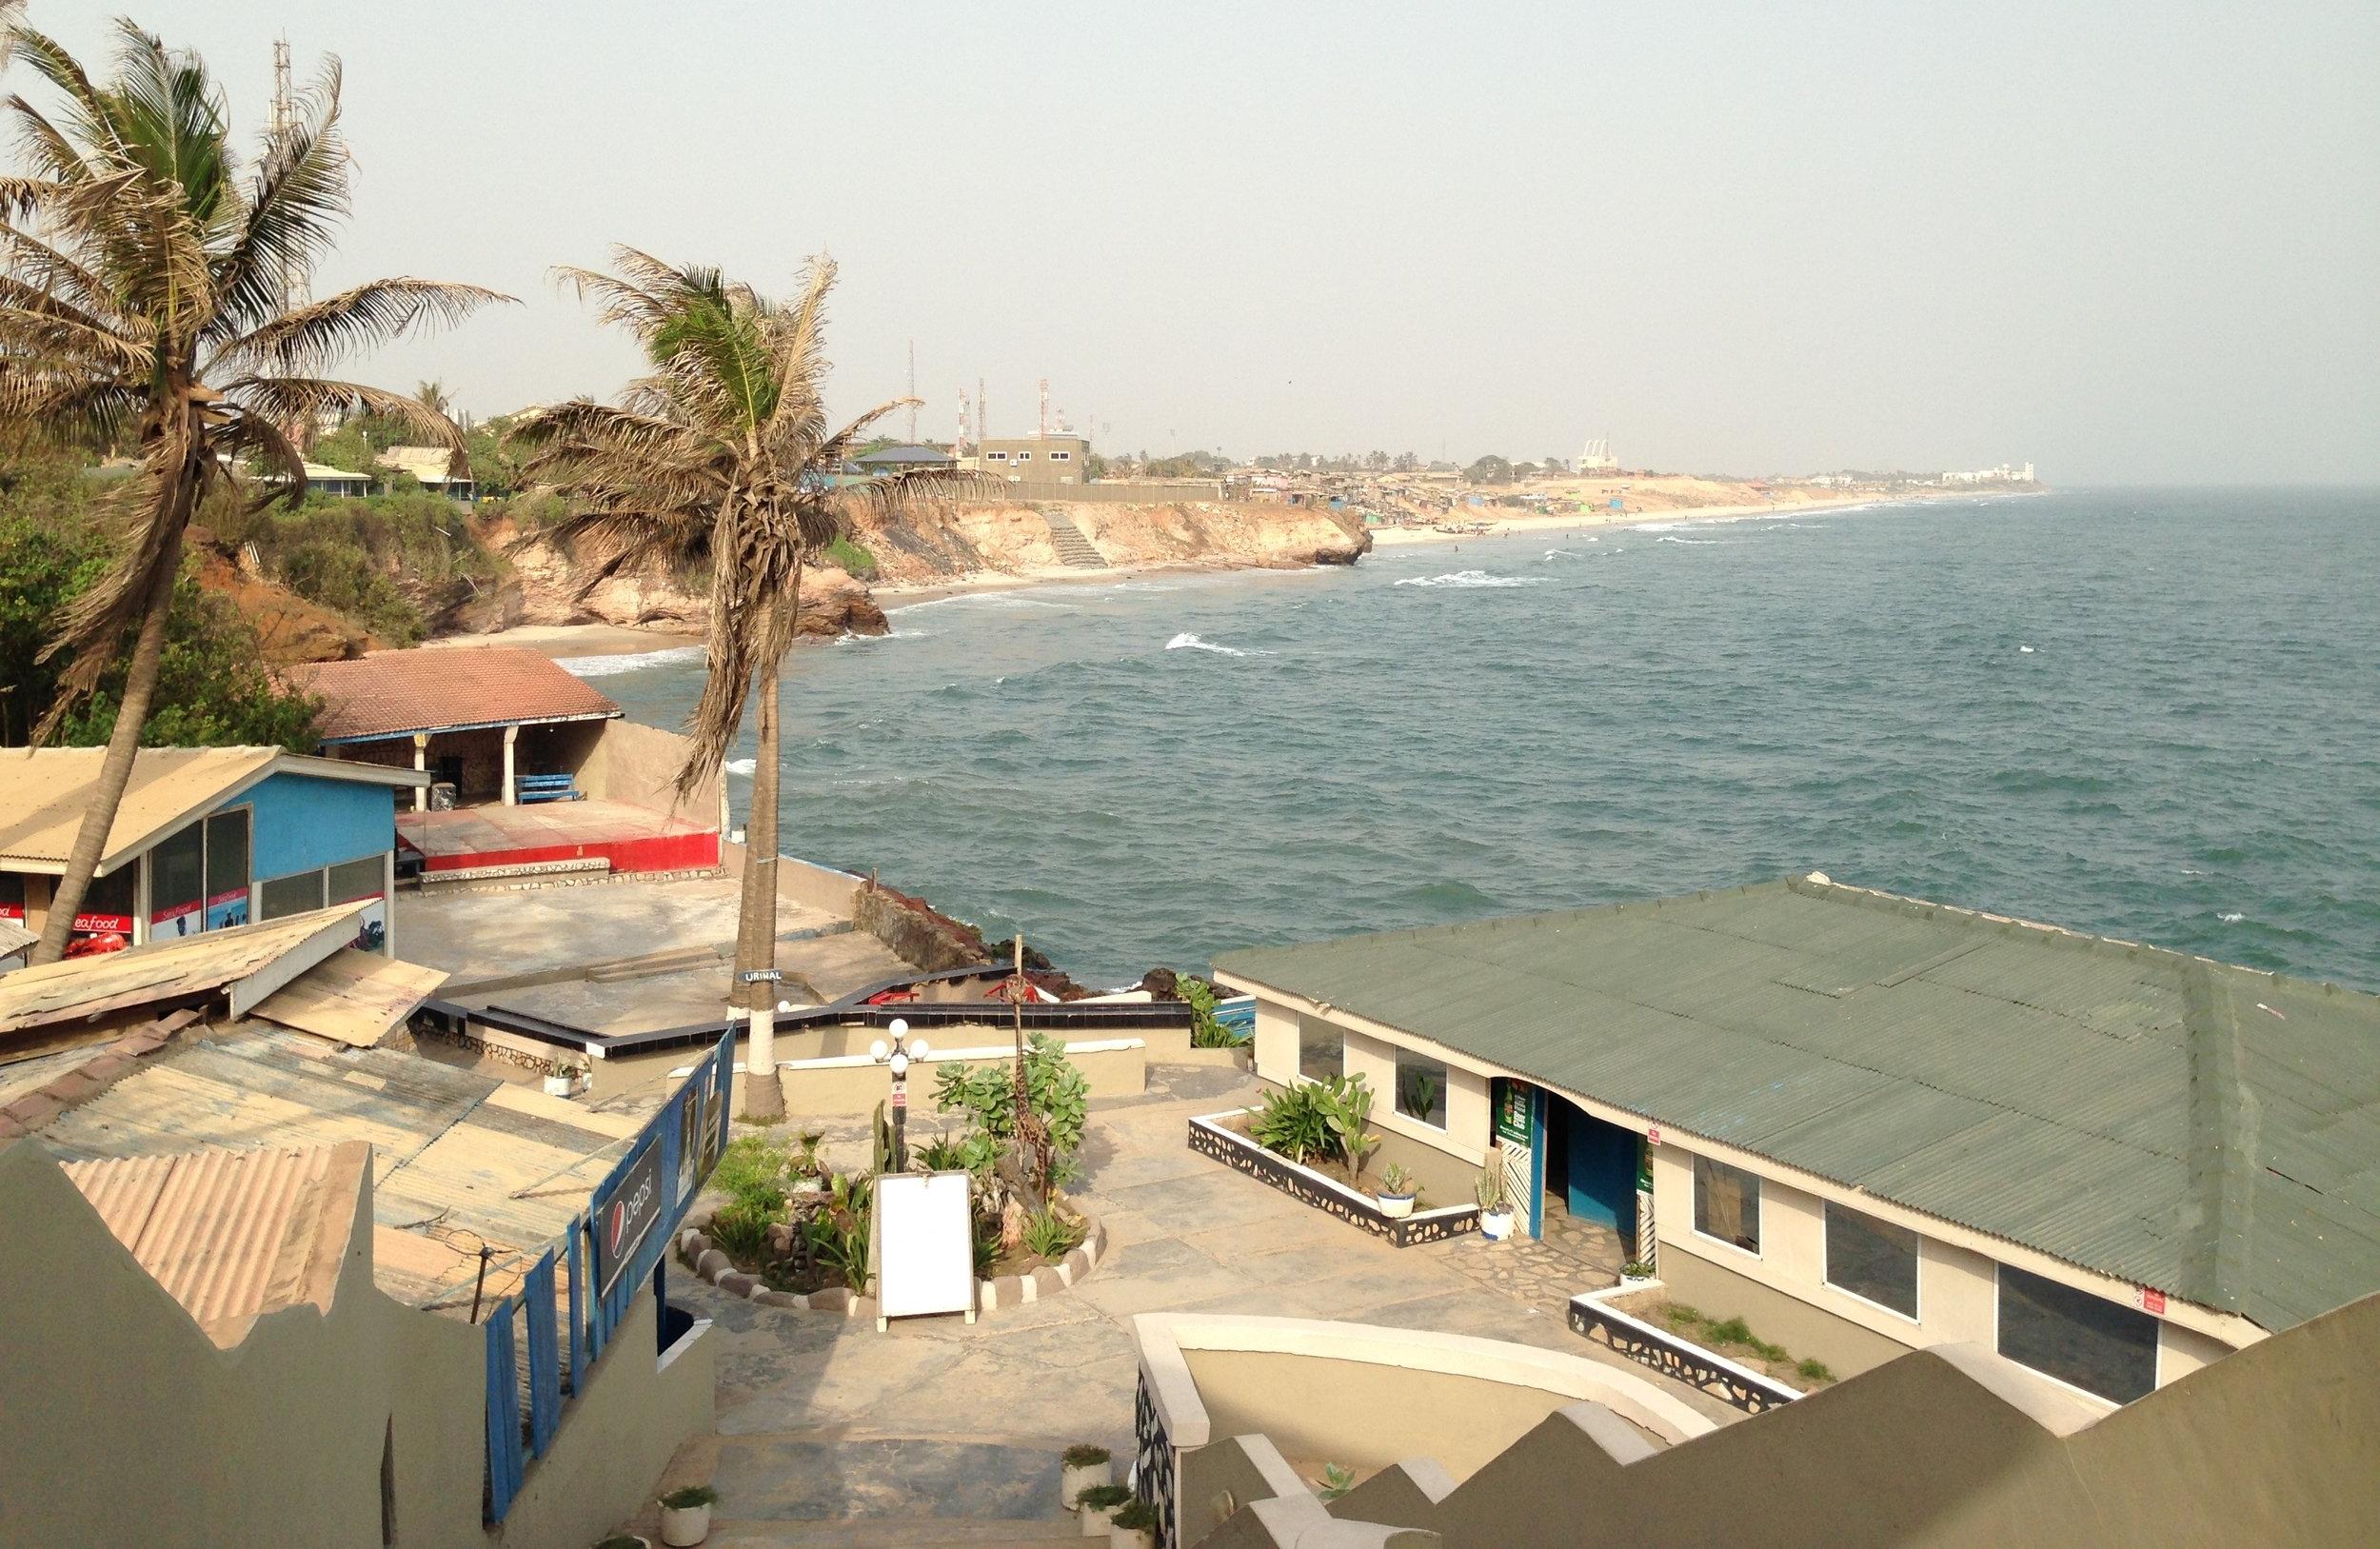 Accra Dec 2013_020_Coastline looking east to Osu Castle. At Salenko resort area. Small bar and restaurant.JPG